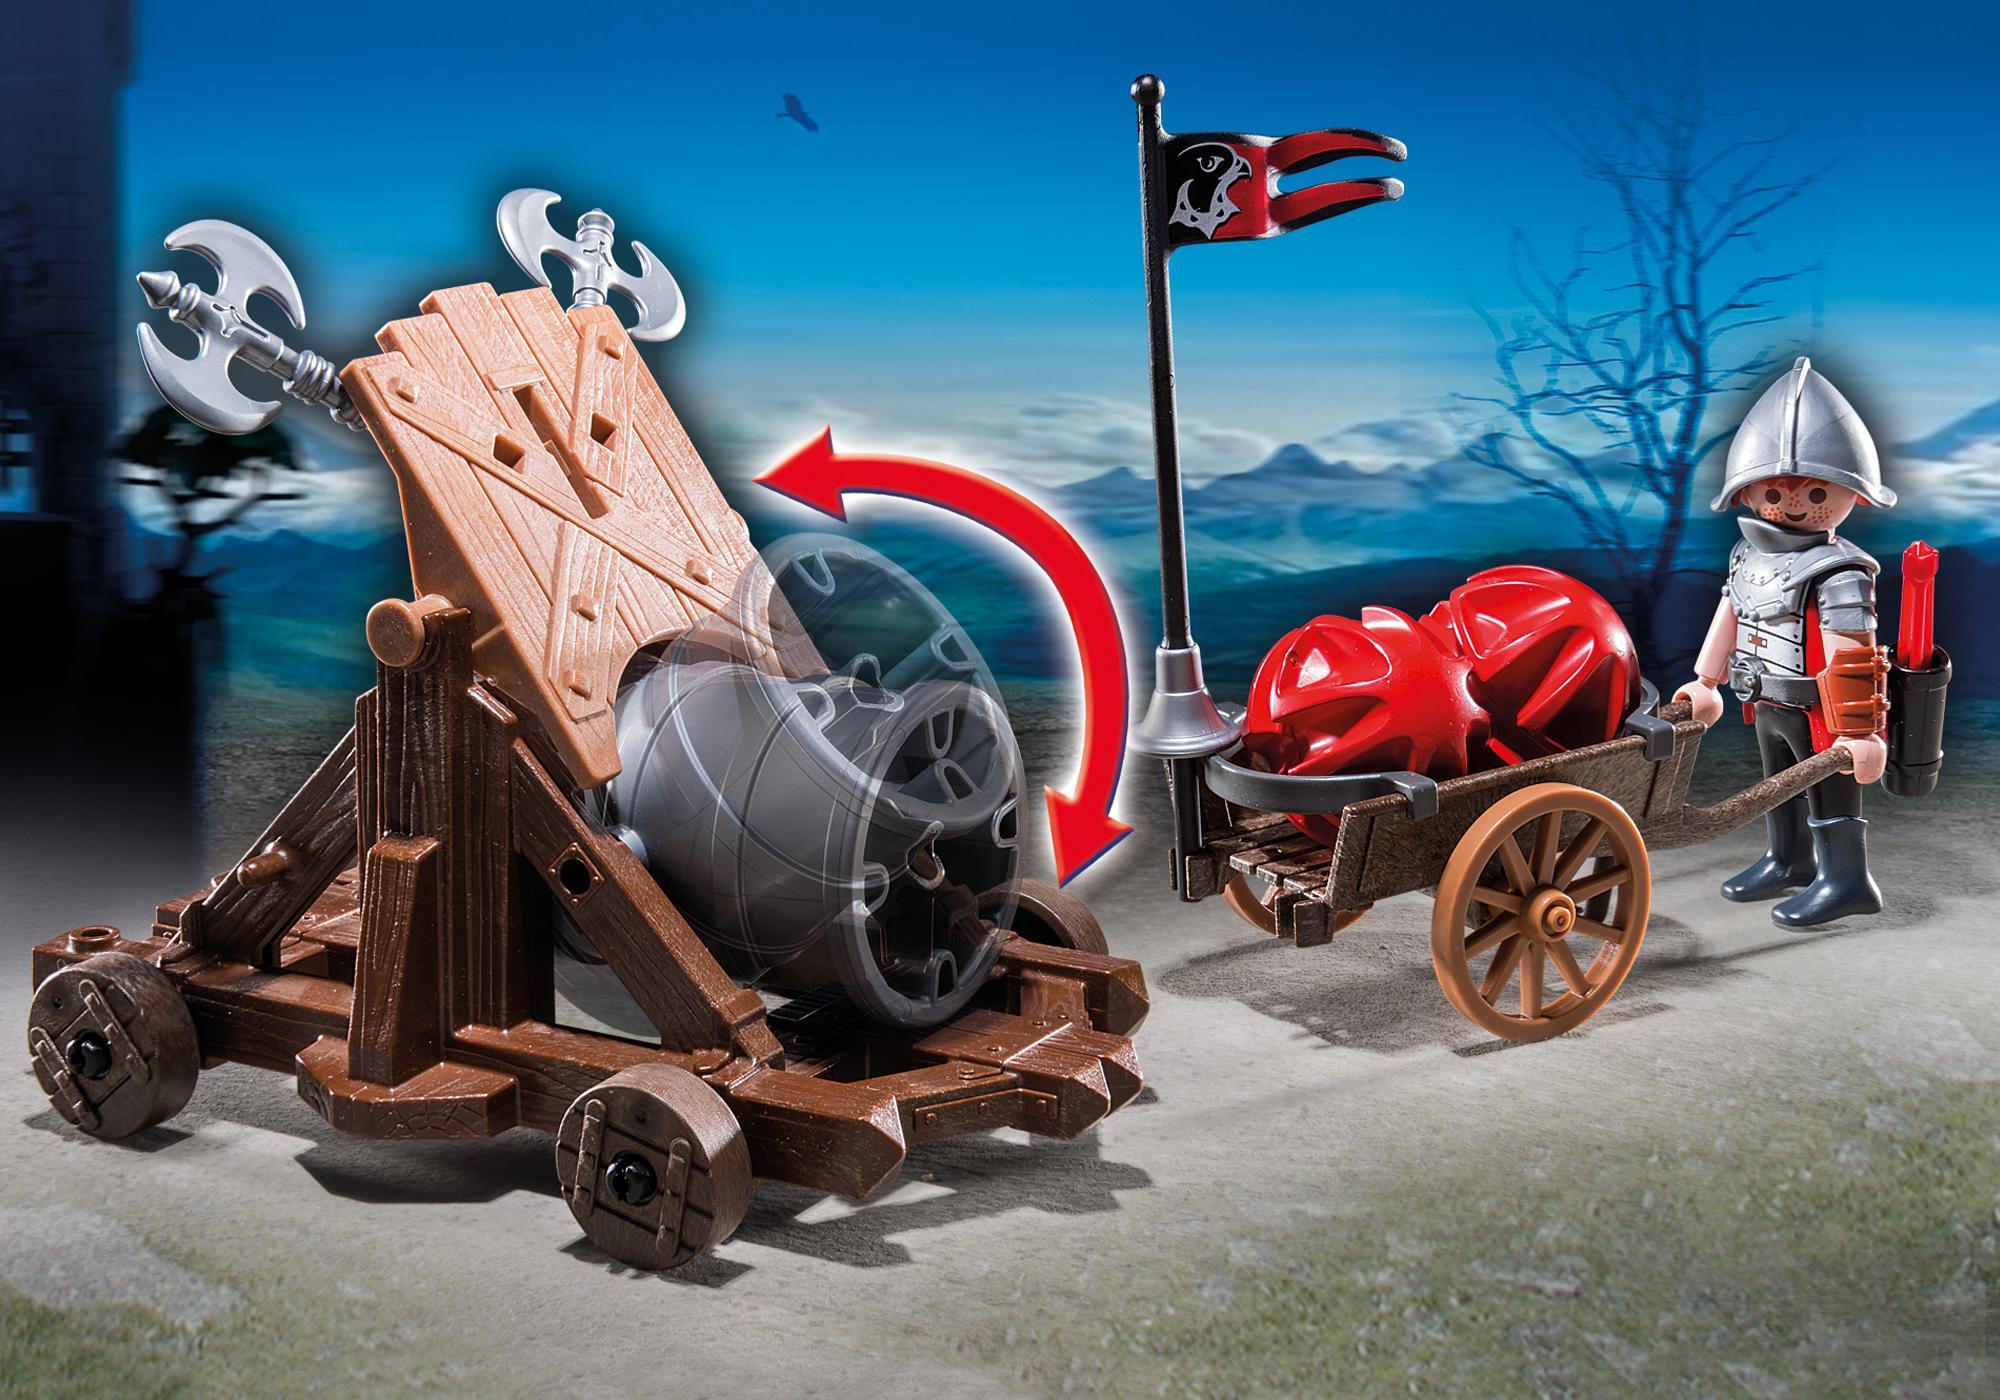 http://media.playmobil.com/i/playmobil/6038_product_extra1/Hawk Knights` Battle Cannon